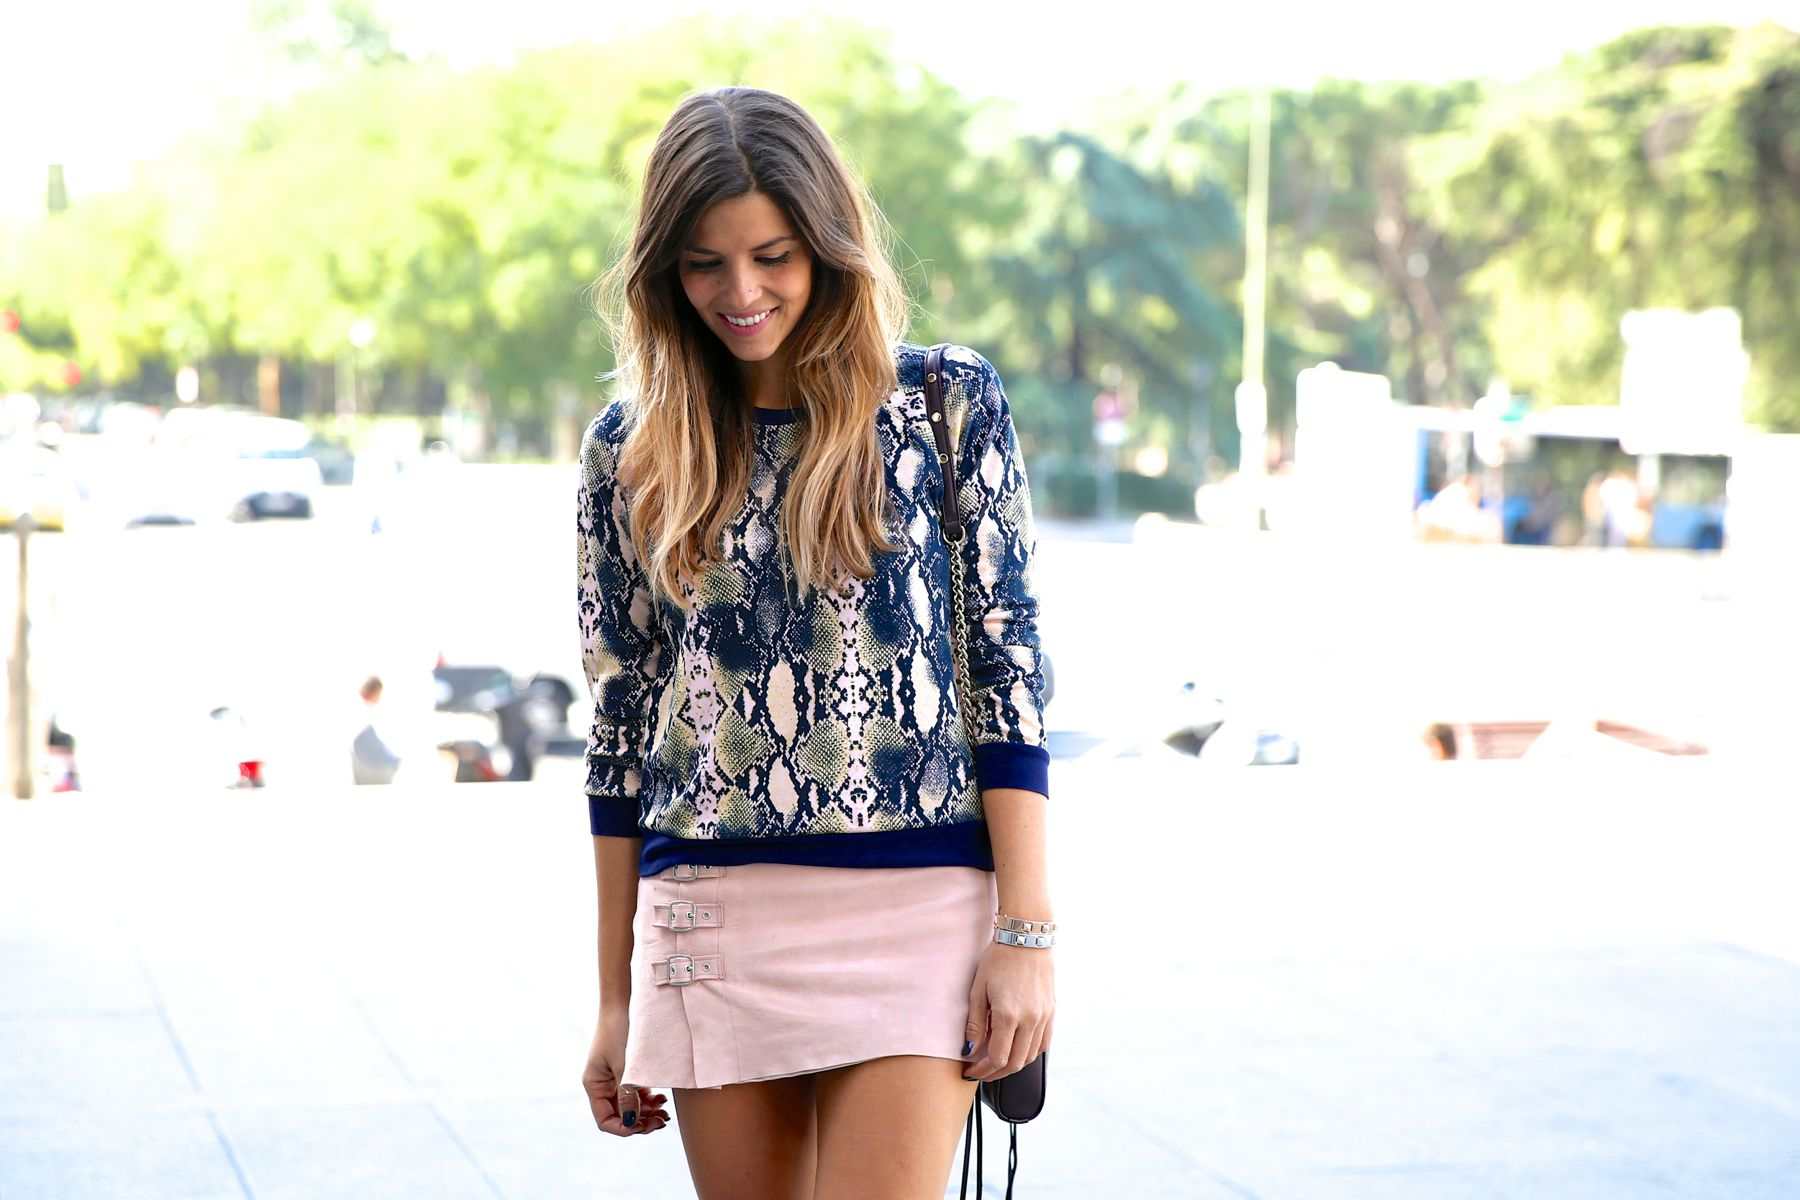 trendy_taste-look-outfit-street_style-ootd-blog-blogger-fashion_spain-moda_españa-girissima.com-sweatshirt-sudadera-estampado-crocodile-cocodrilo-botines-booties-pink_skirt-falda_rosa-3